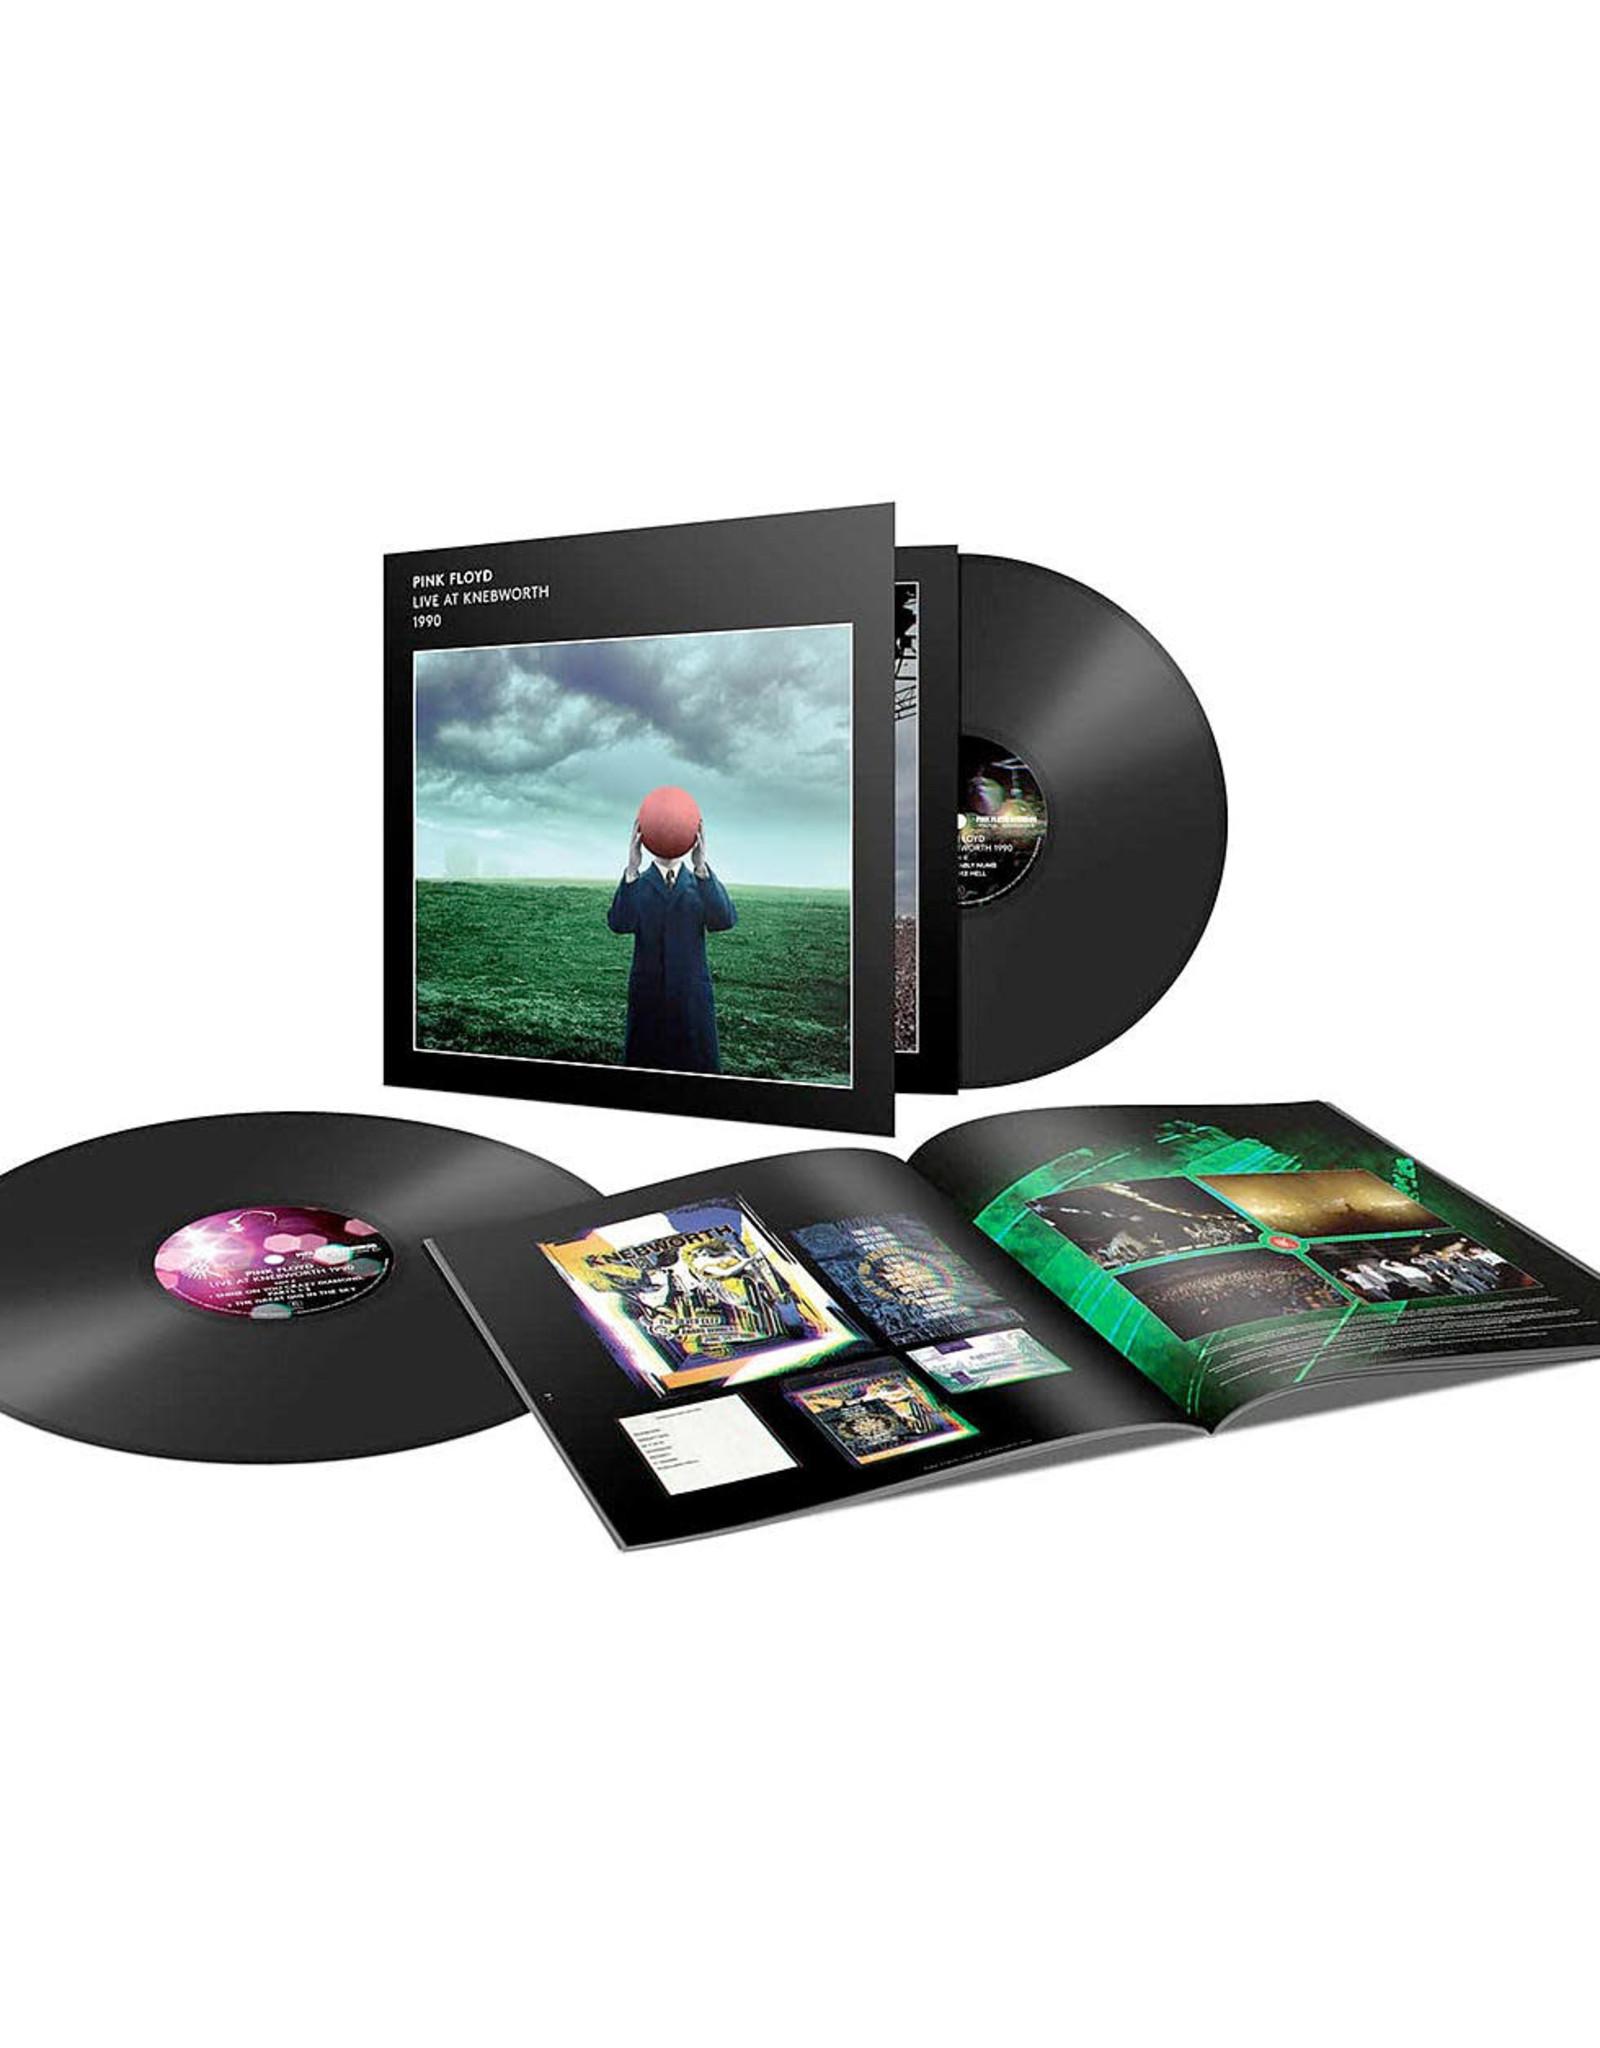 Pink Floyd - Live At Knebworth 1990 LP